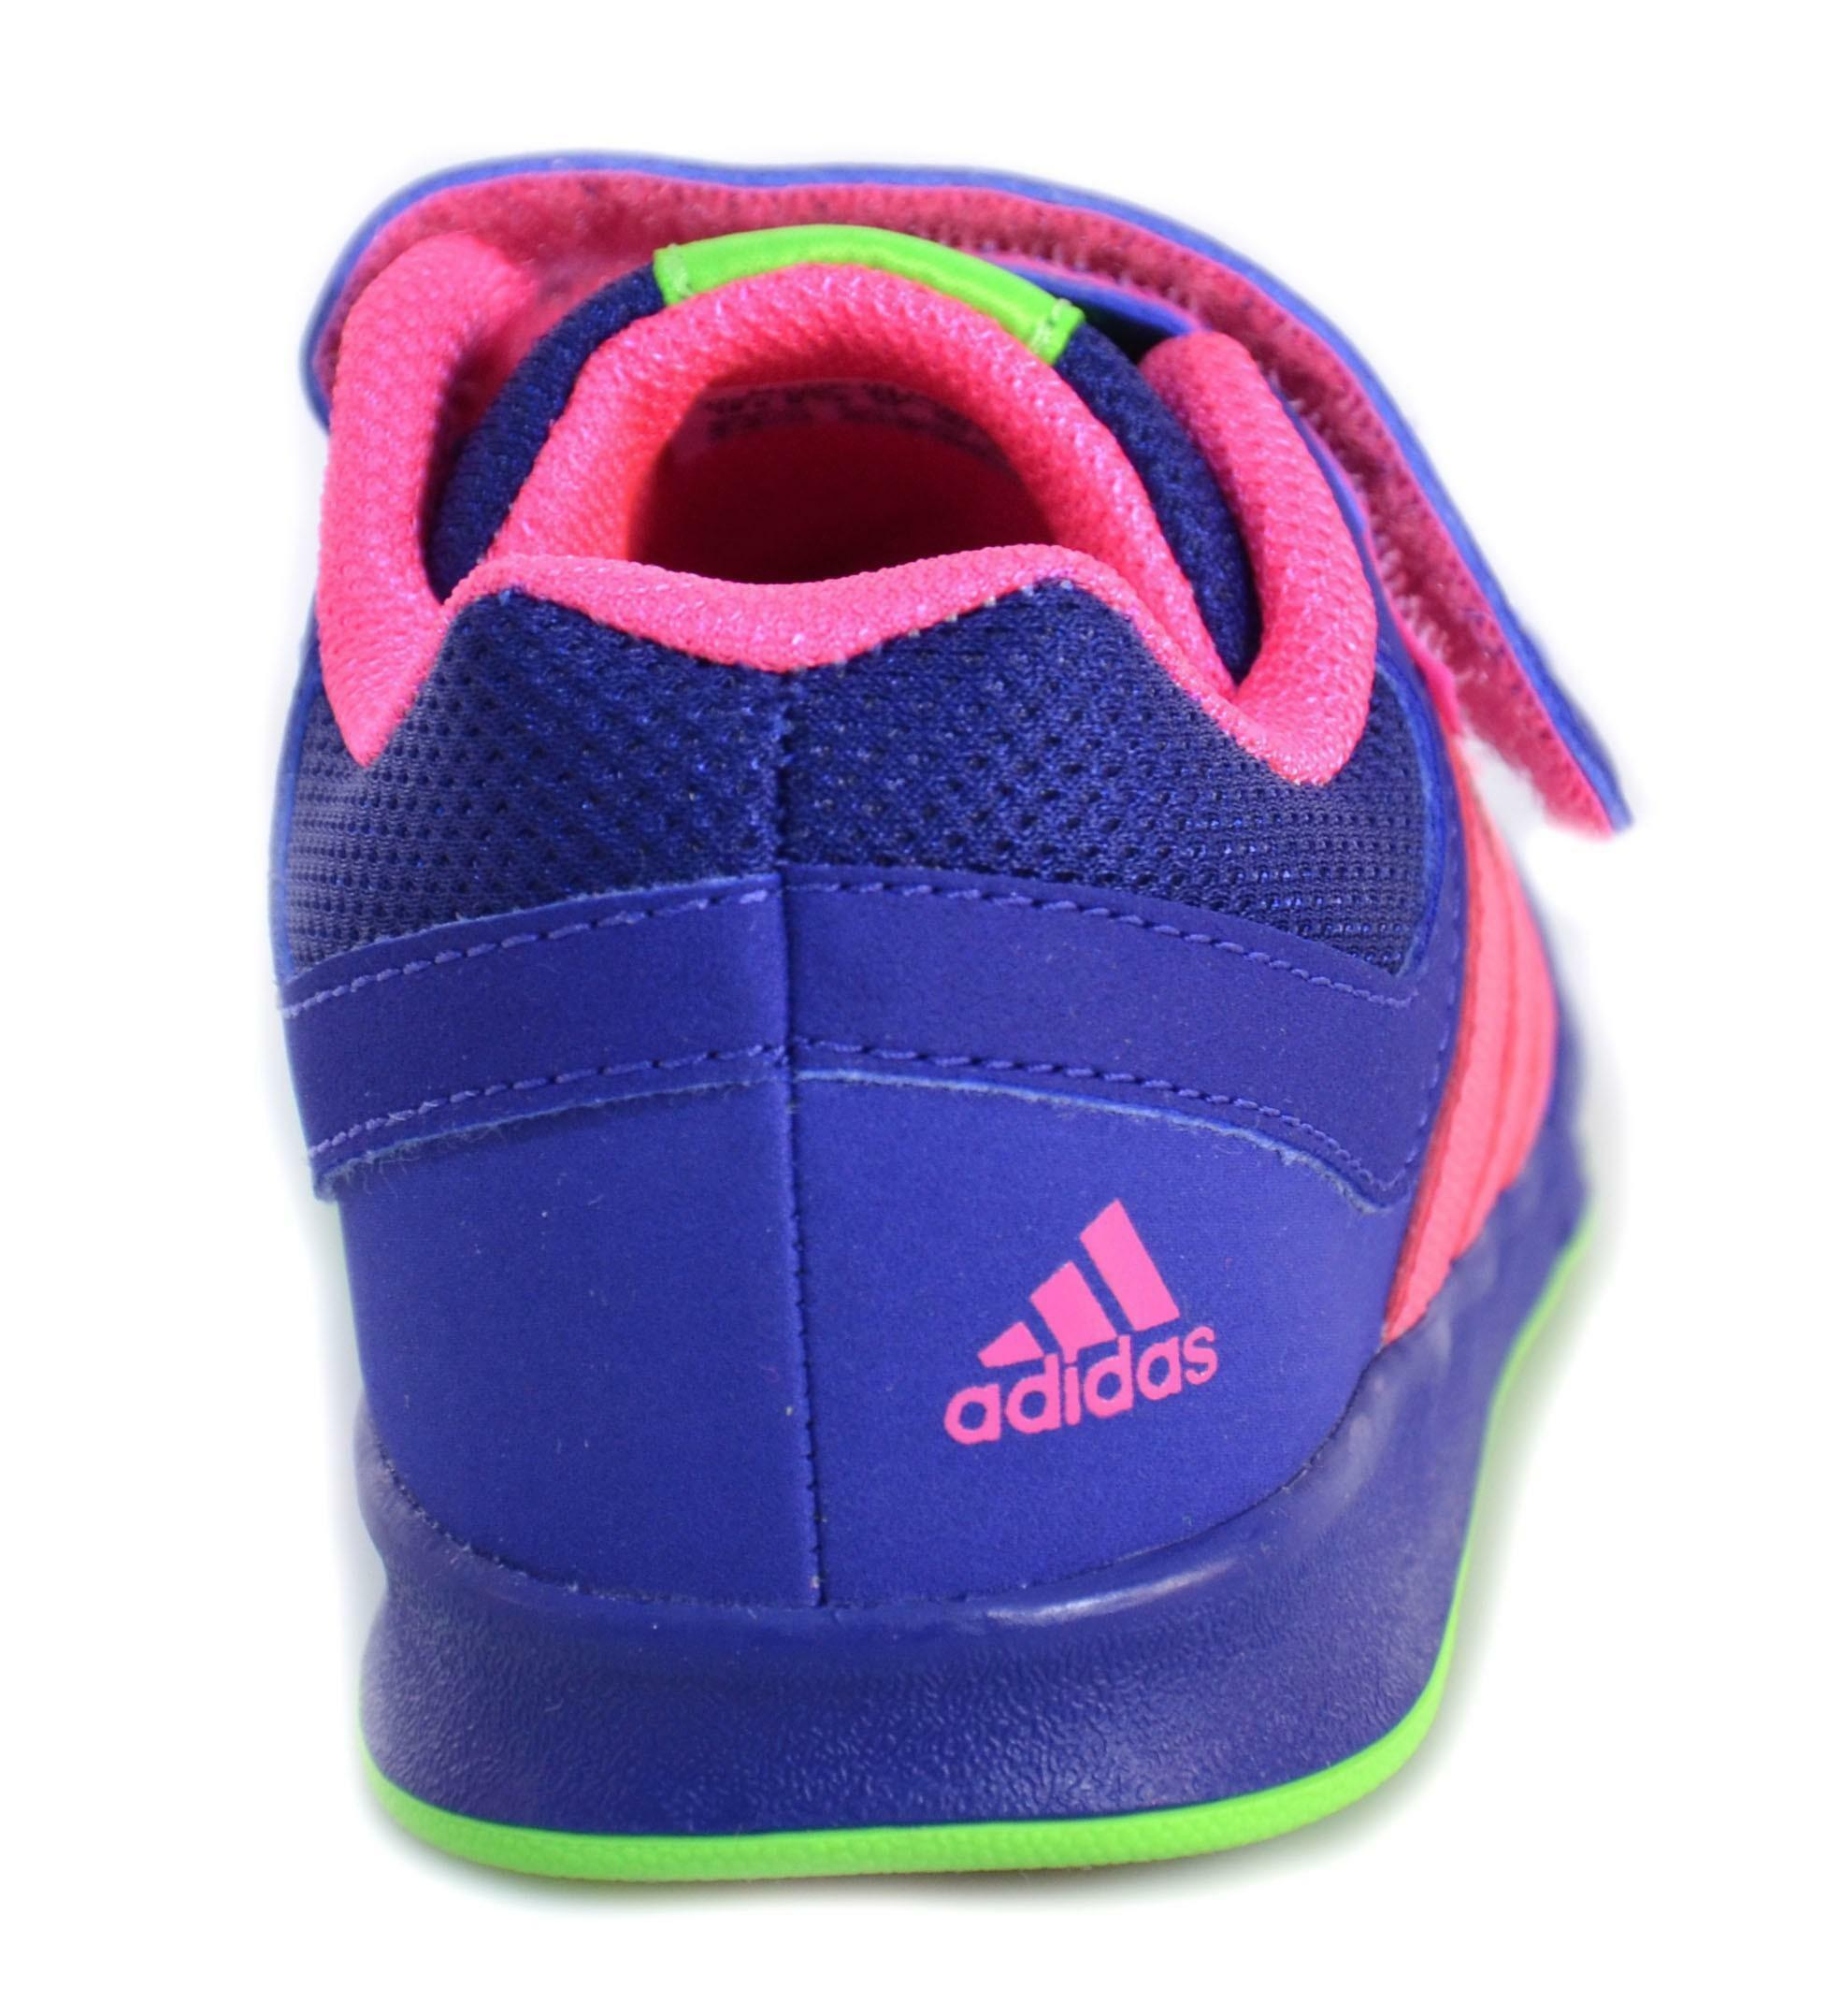 adidas adidas lk trainer 6 cf i scarpe bambina viola pelle strappi m20050